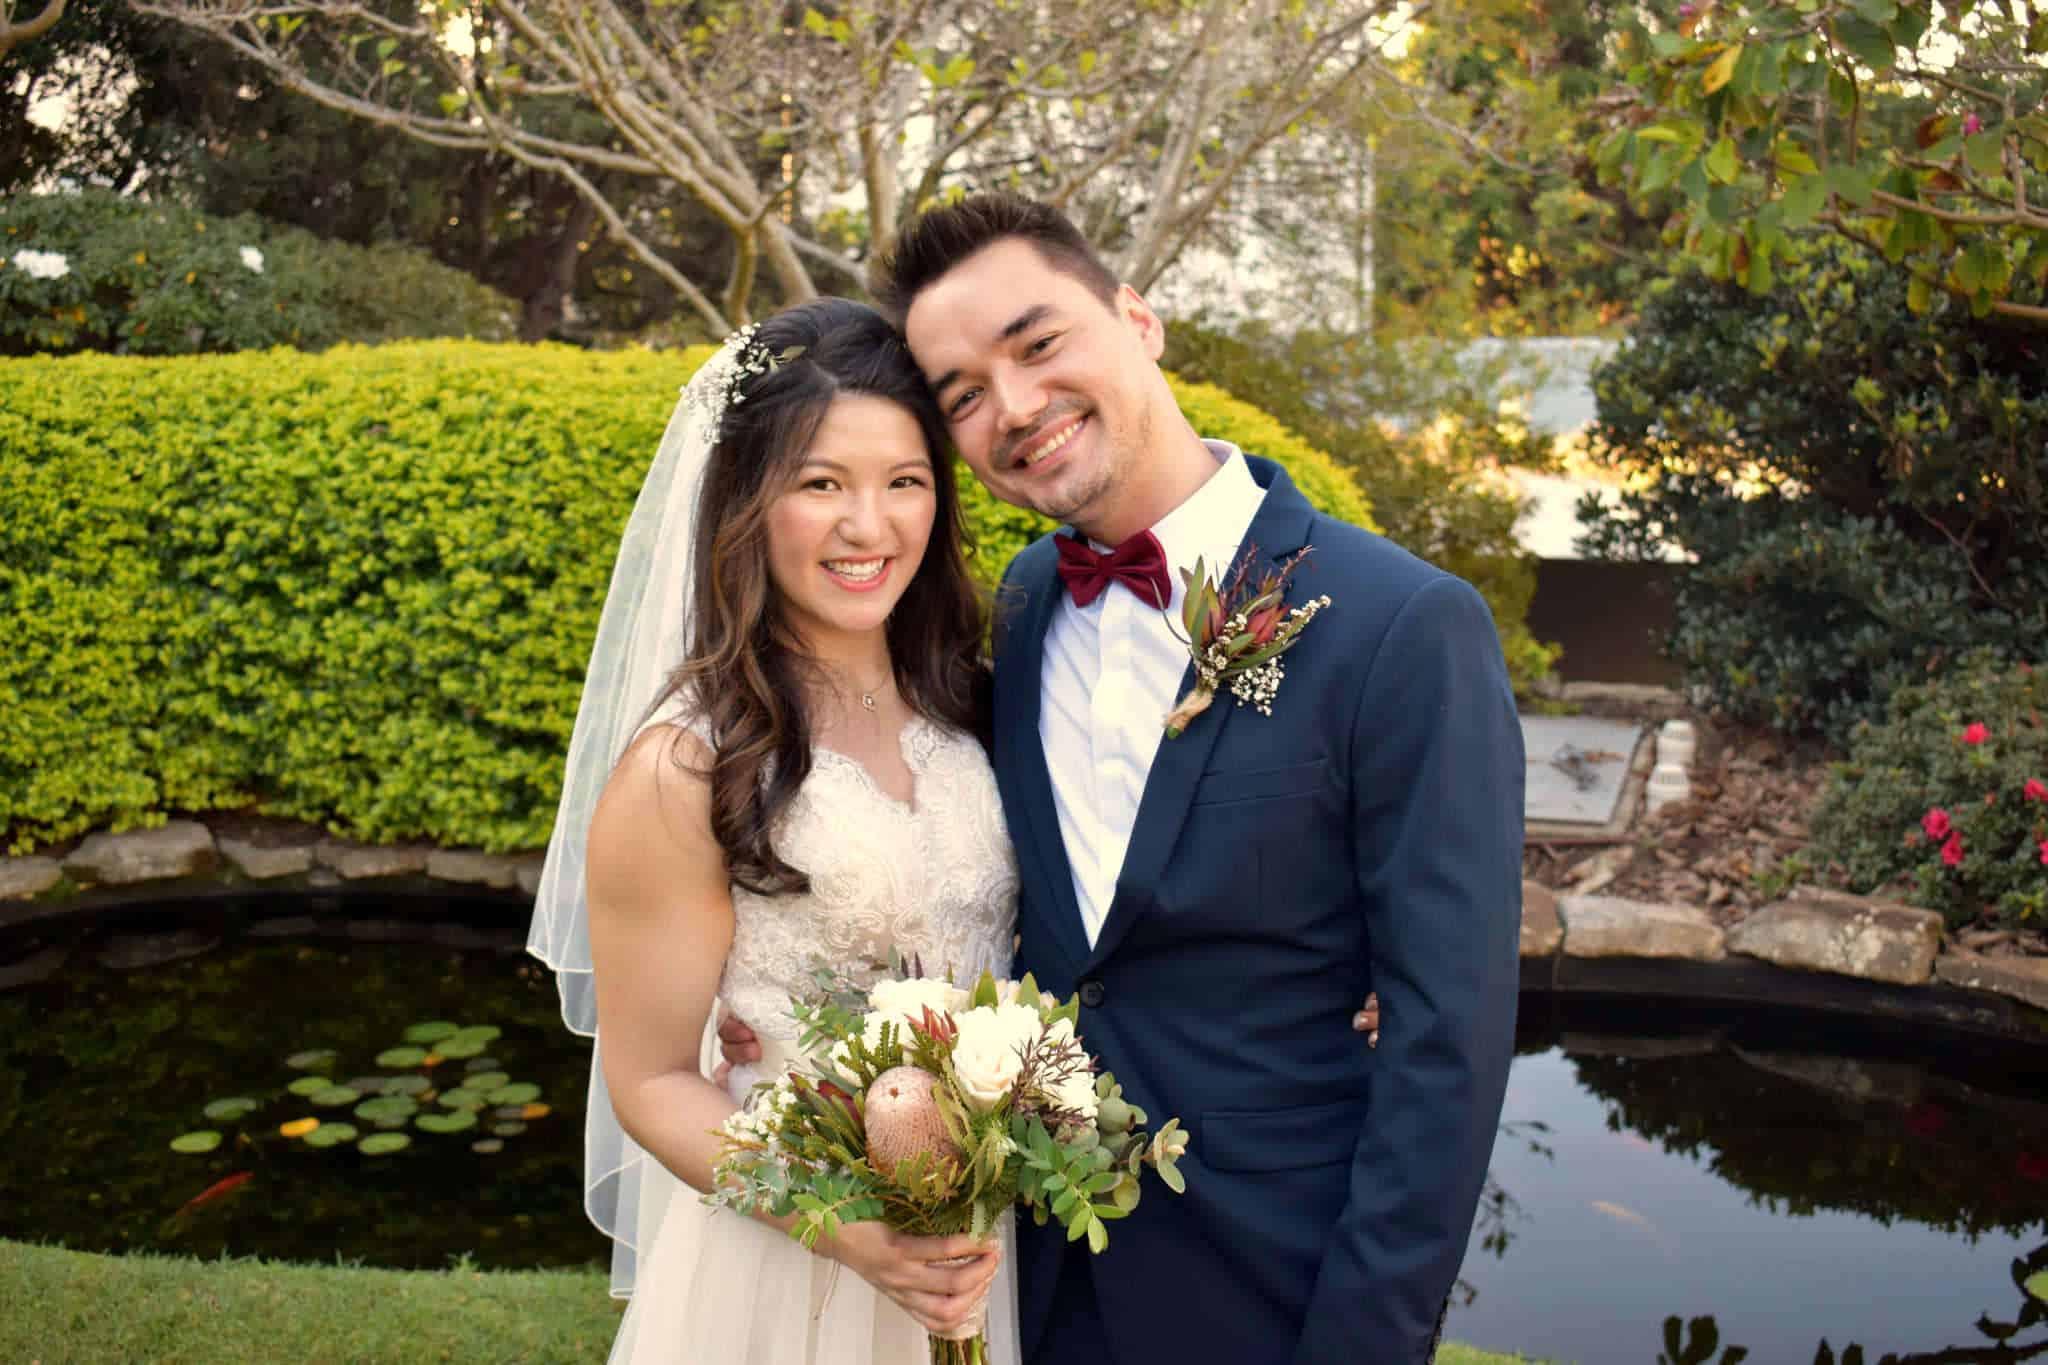 Elizabeth Bay Wedding - Stephen Lee Sydney Marriage Celebrant